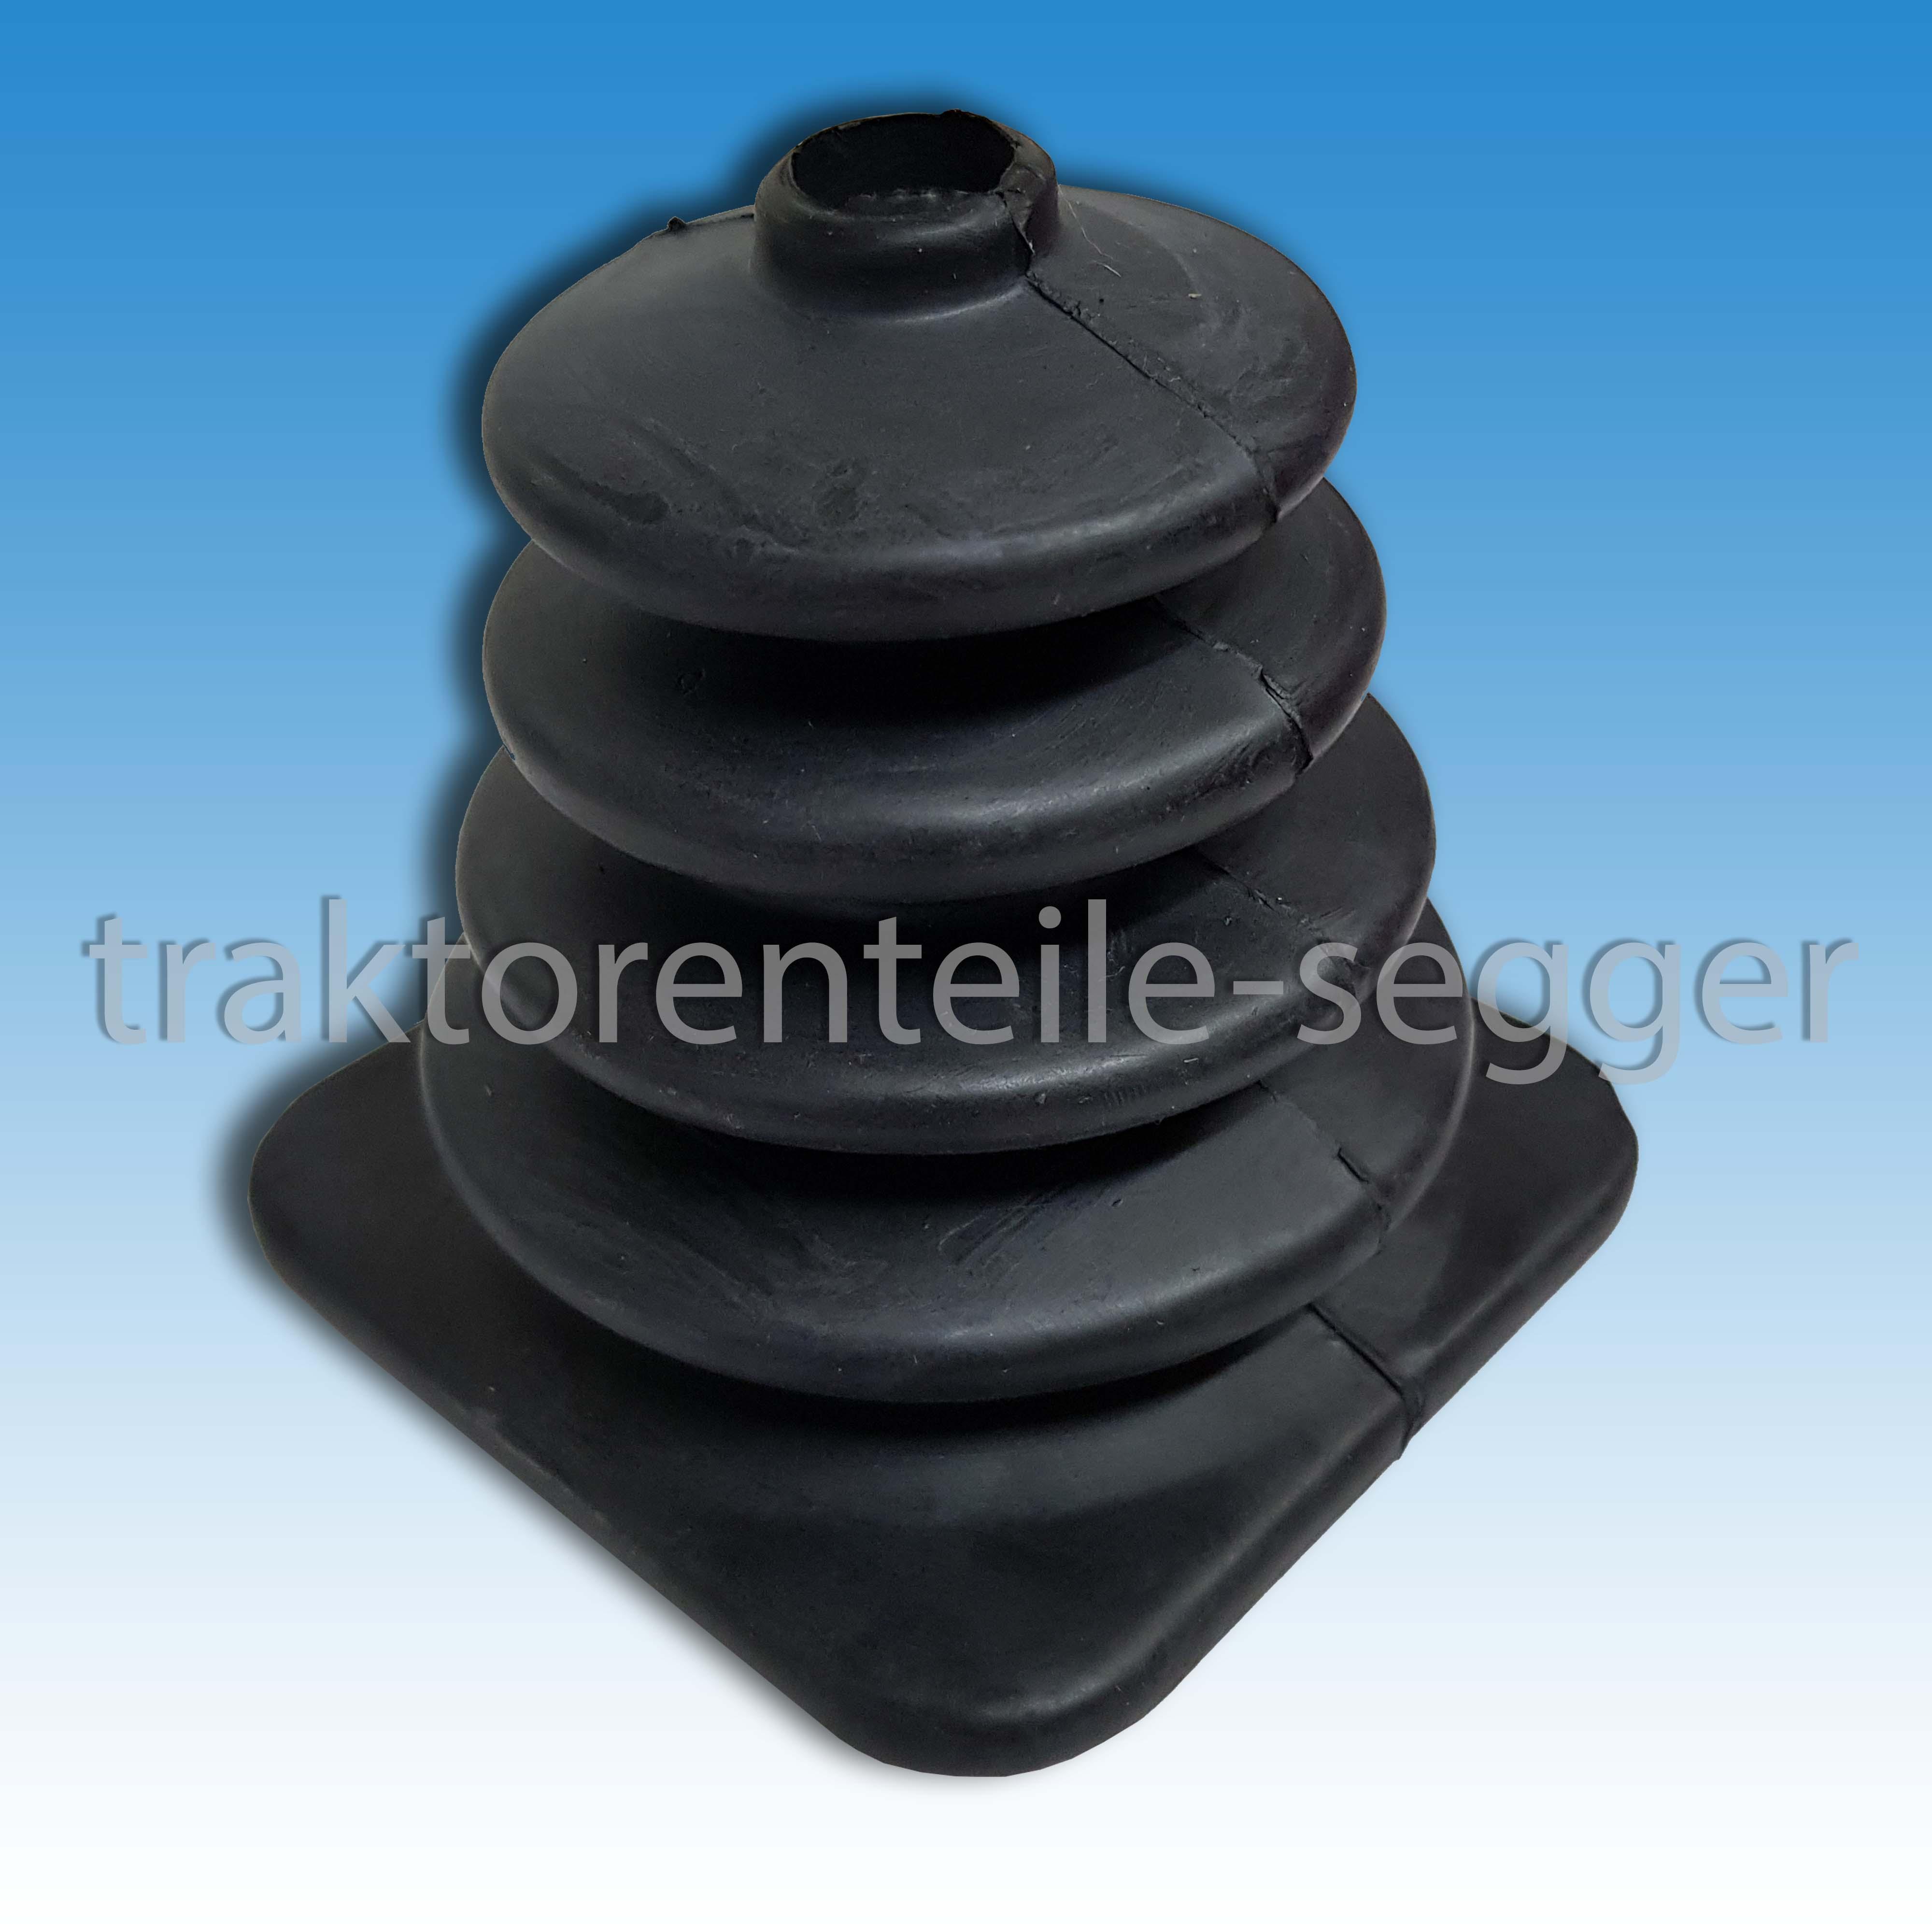 2 x Deutz Schalthebelmanschette Schalthebelgummi Faltenbalg 06 Serie 4006 5006